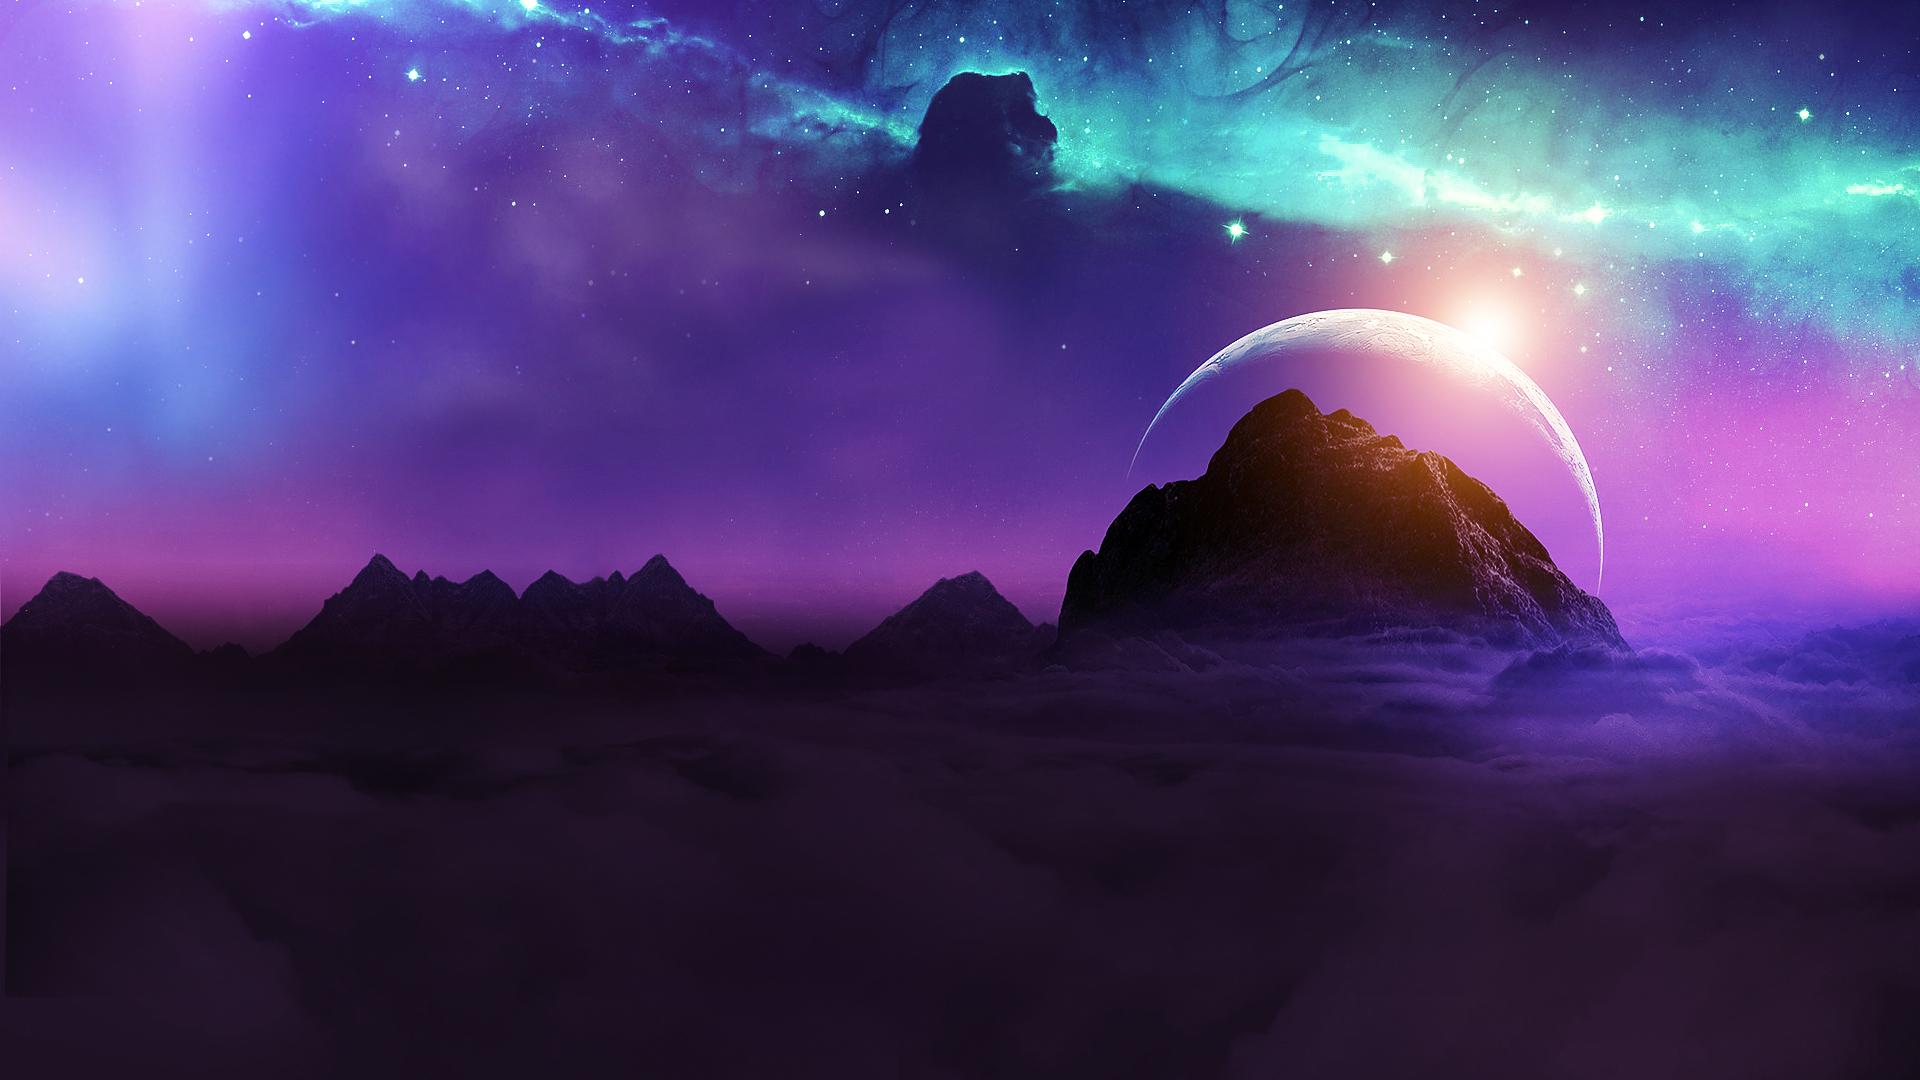 Planet Rising Over Galaxy Wallpaper, HD Fantasy 4K ...